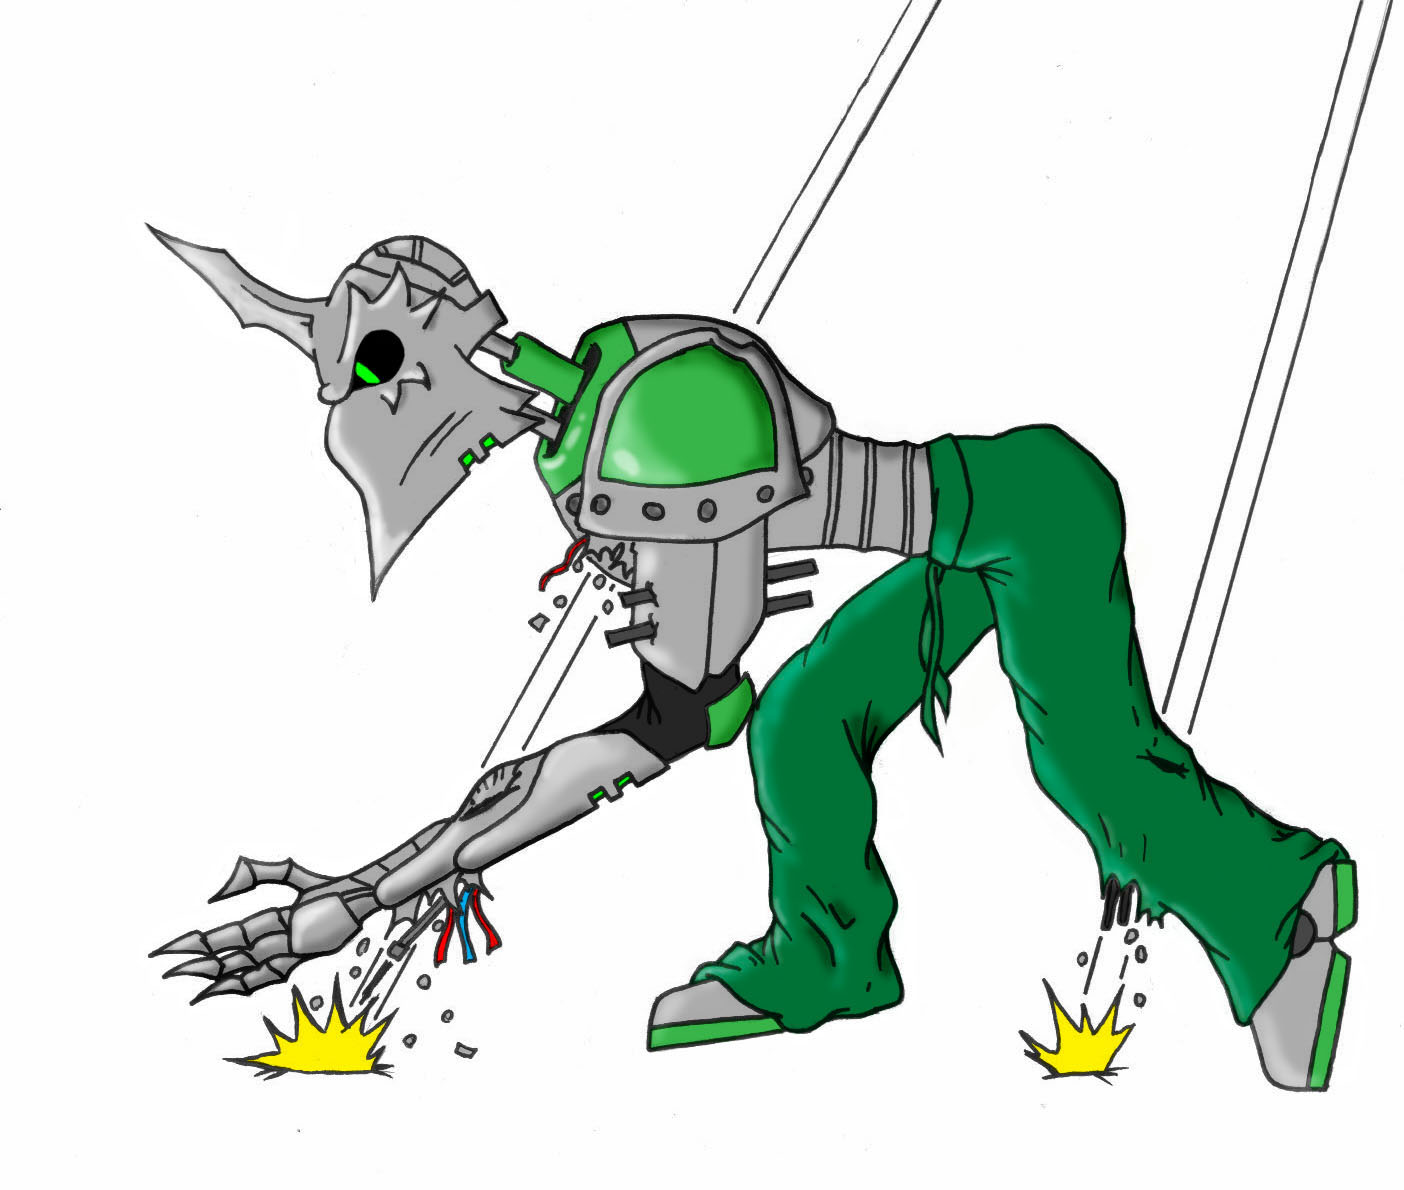 Robot Shot